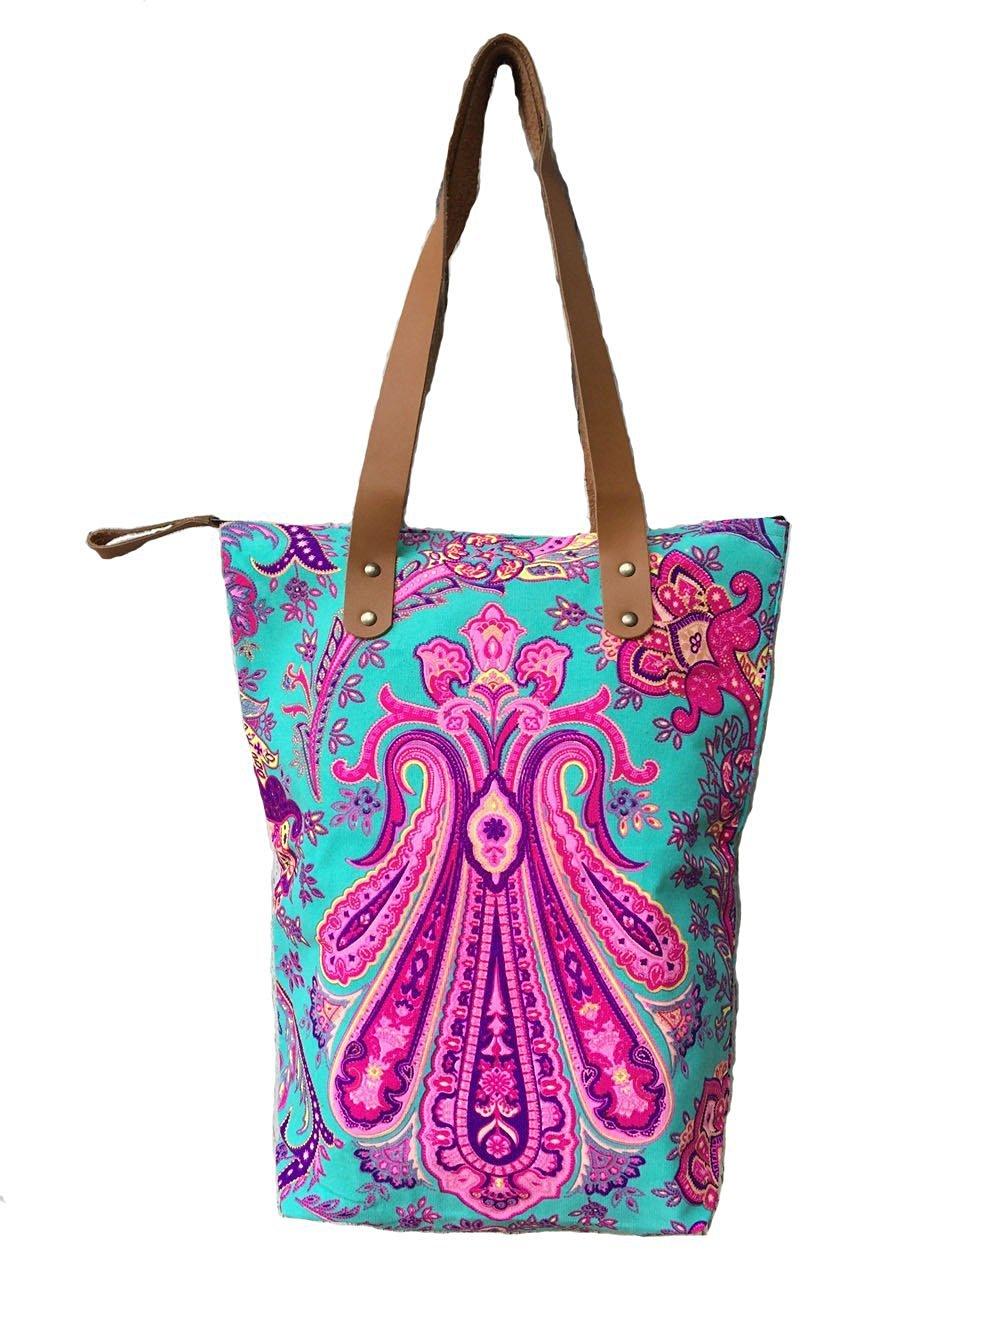 b1fda51afd7f Cheap Neon Canvas Bag, find Neon Canvas Bag deals on line at Alibaba.com